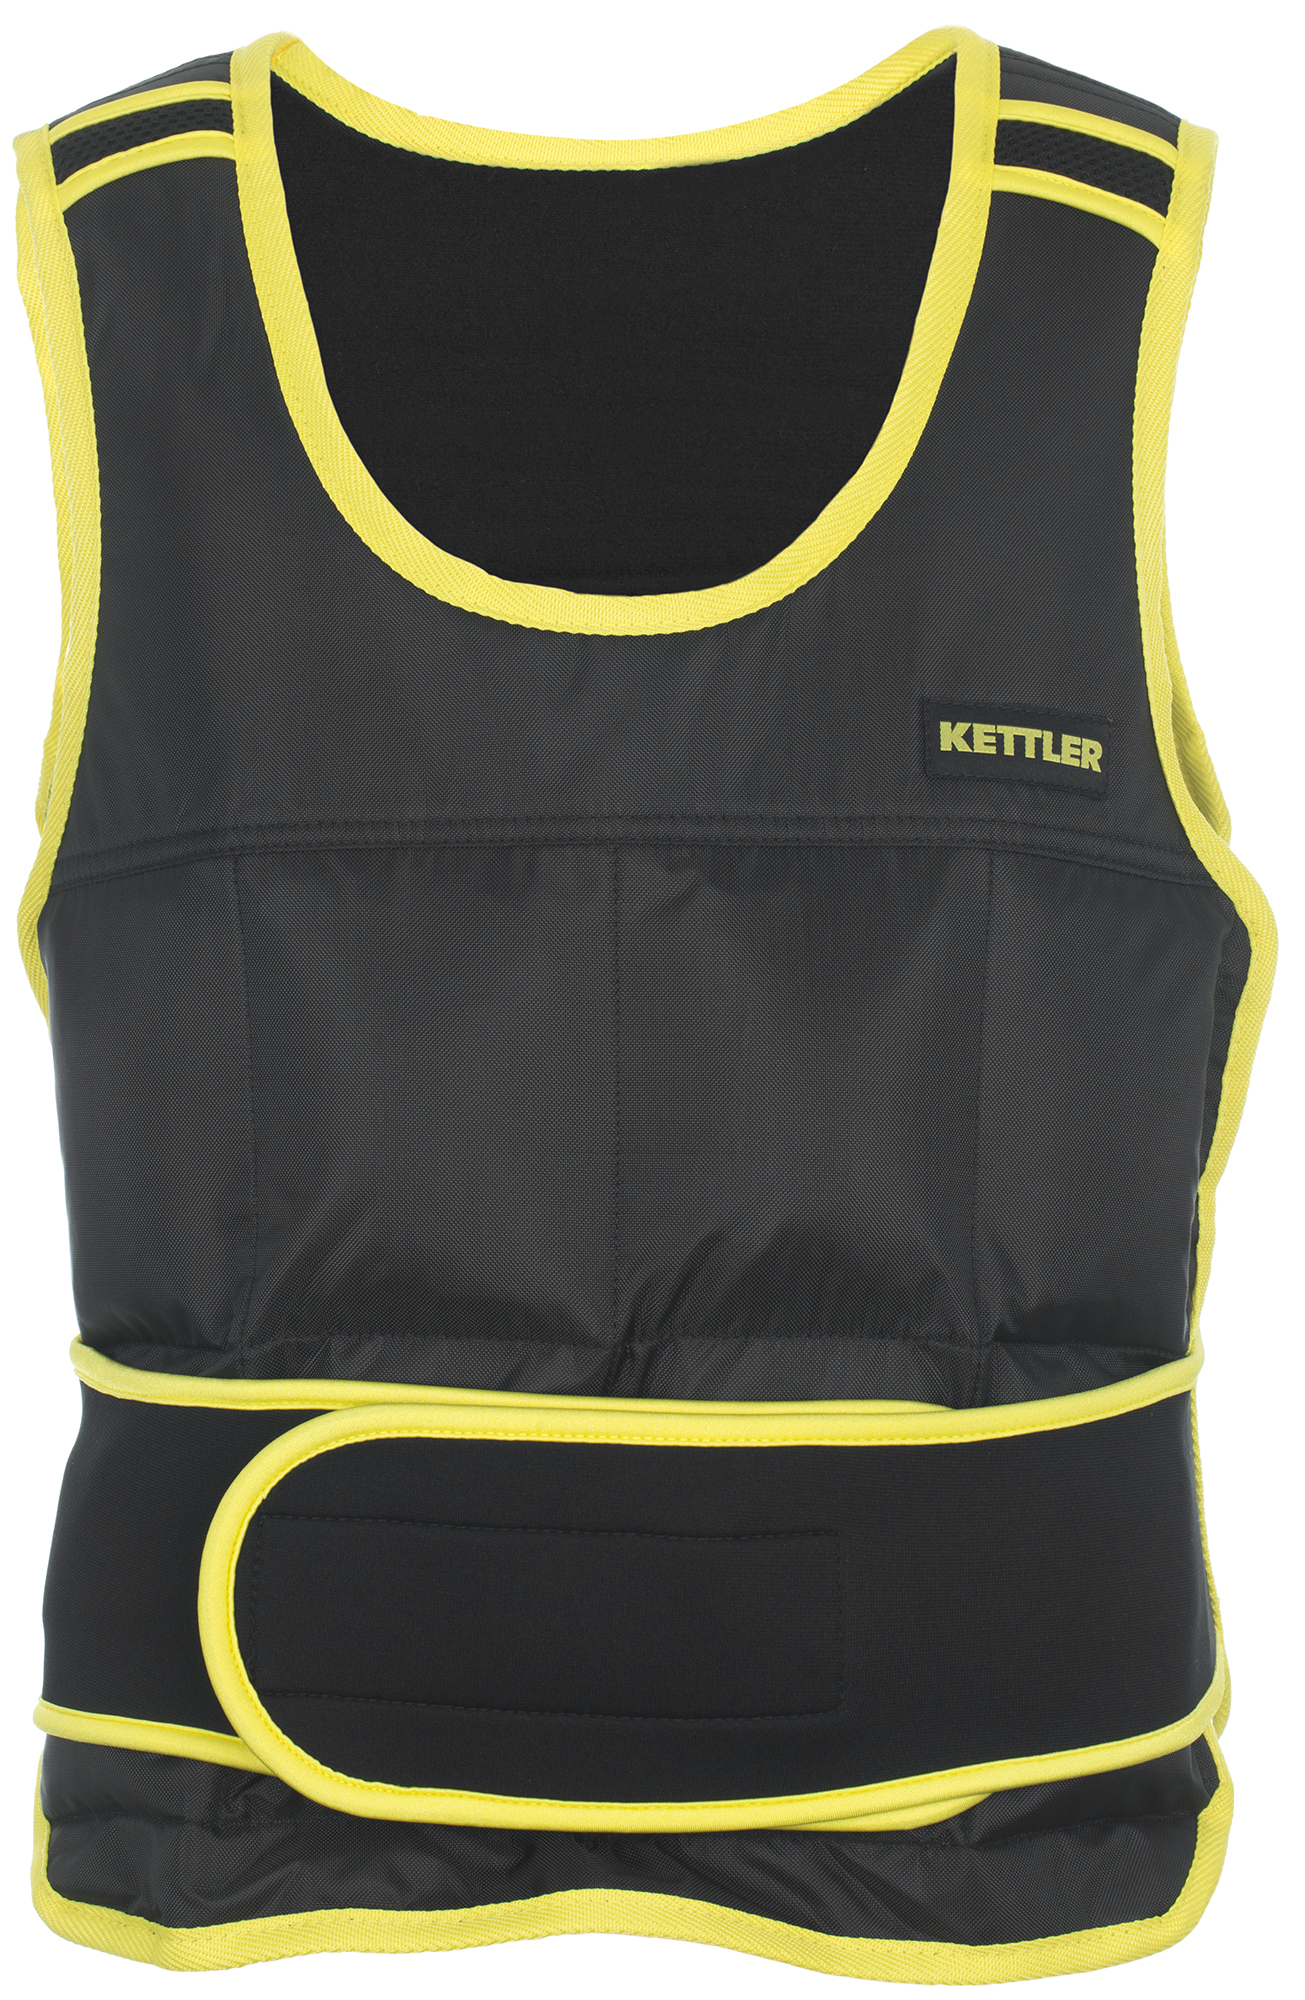 Kettler Жилет утяжеленный Kettler, 6 кг 7373-450 цена в Москве и Питере